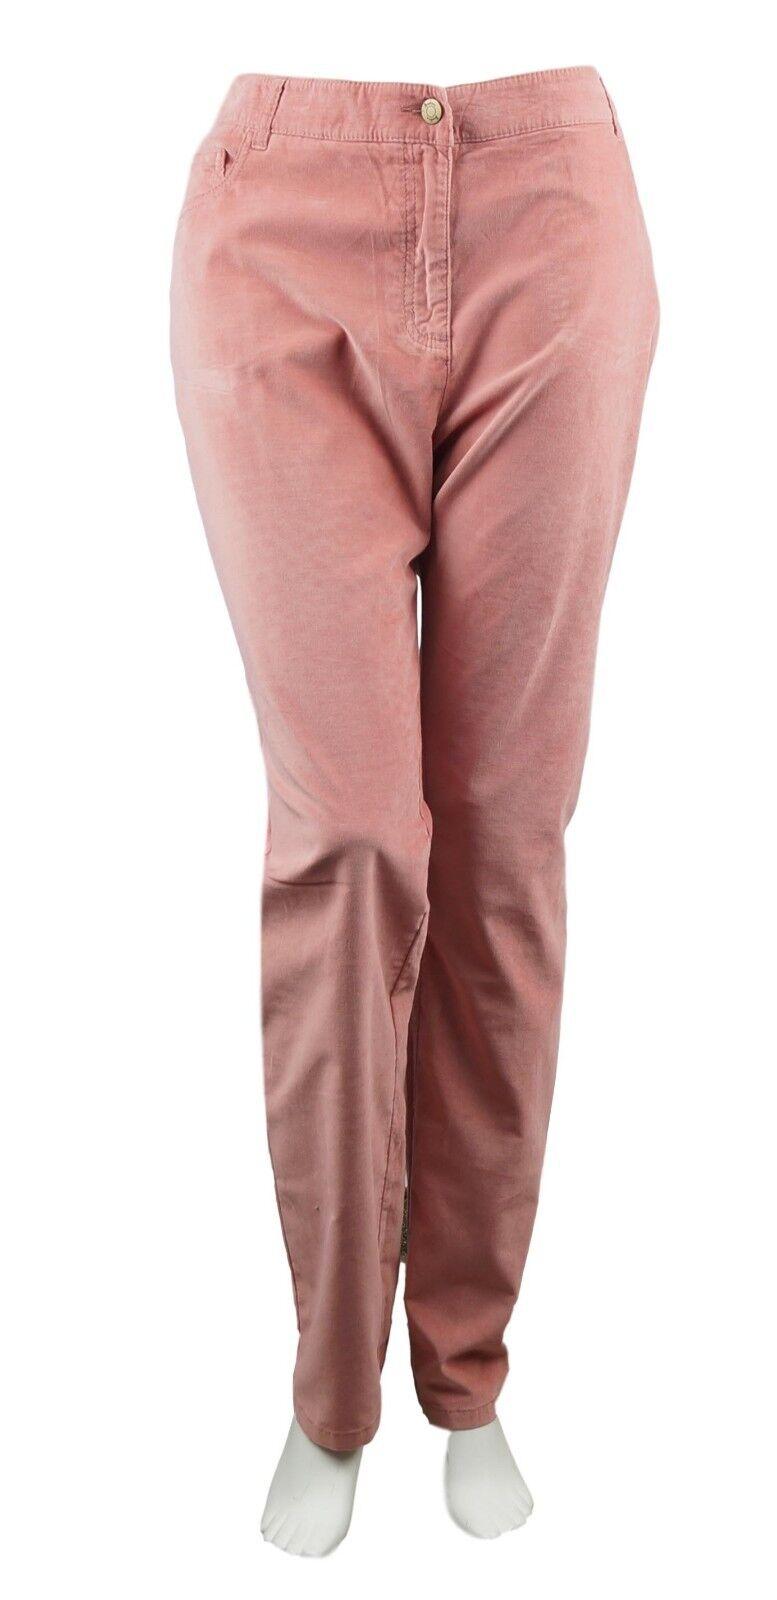 Boden daMänner Trousers Stretch Größe 46r uk.20r Hose Velvet Trousers 98% Cotton    0671